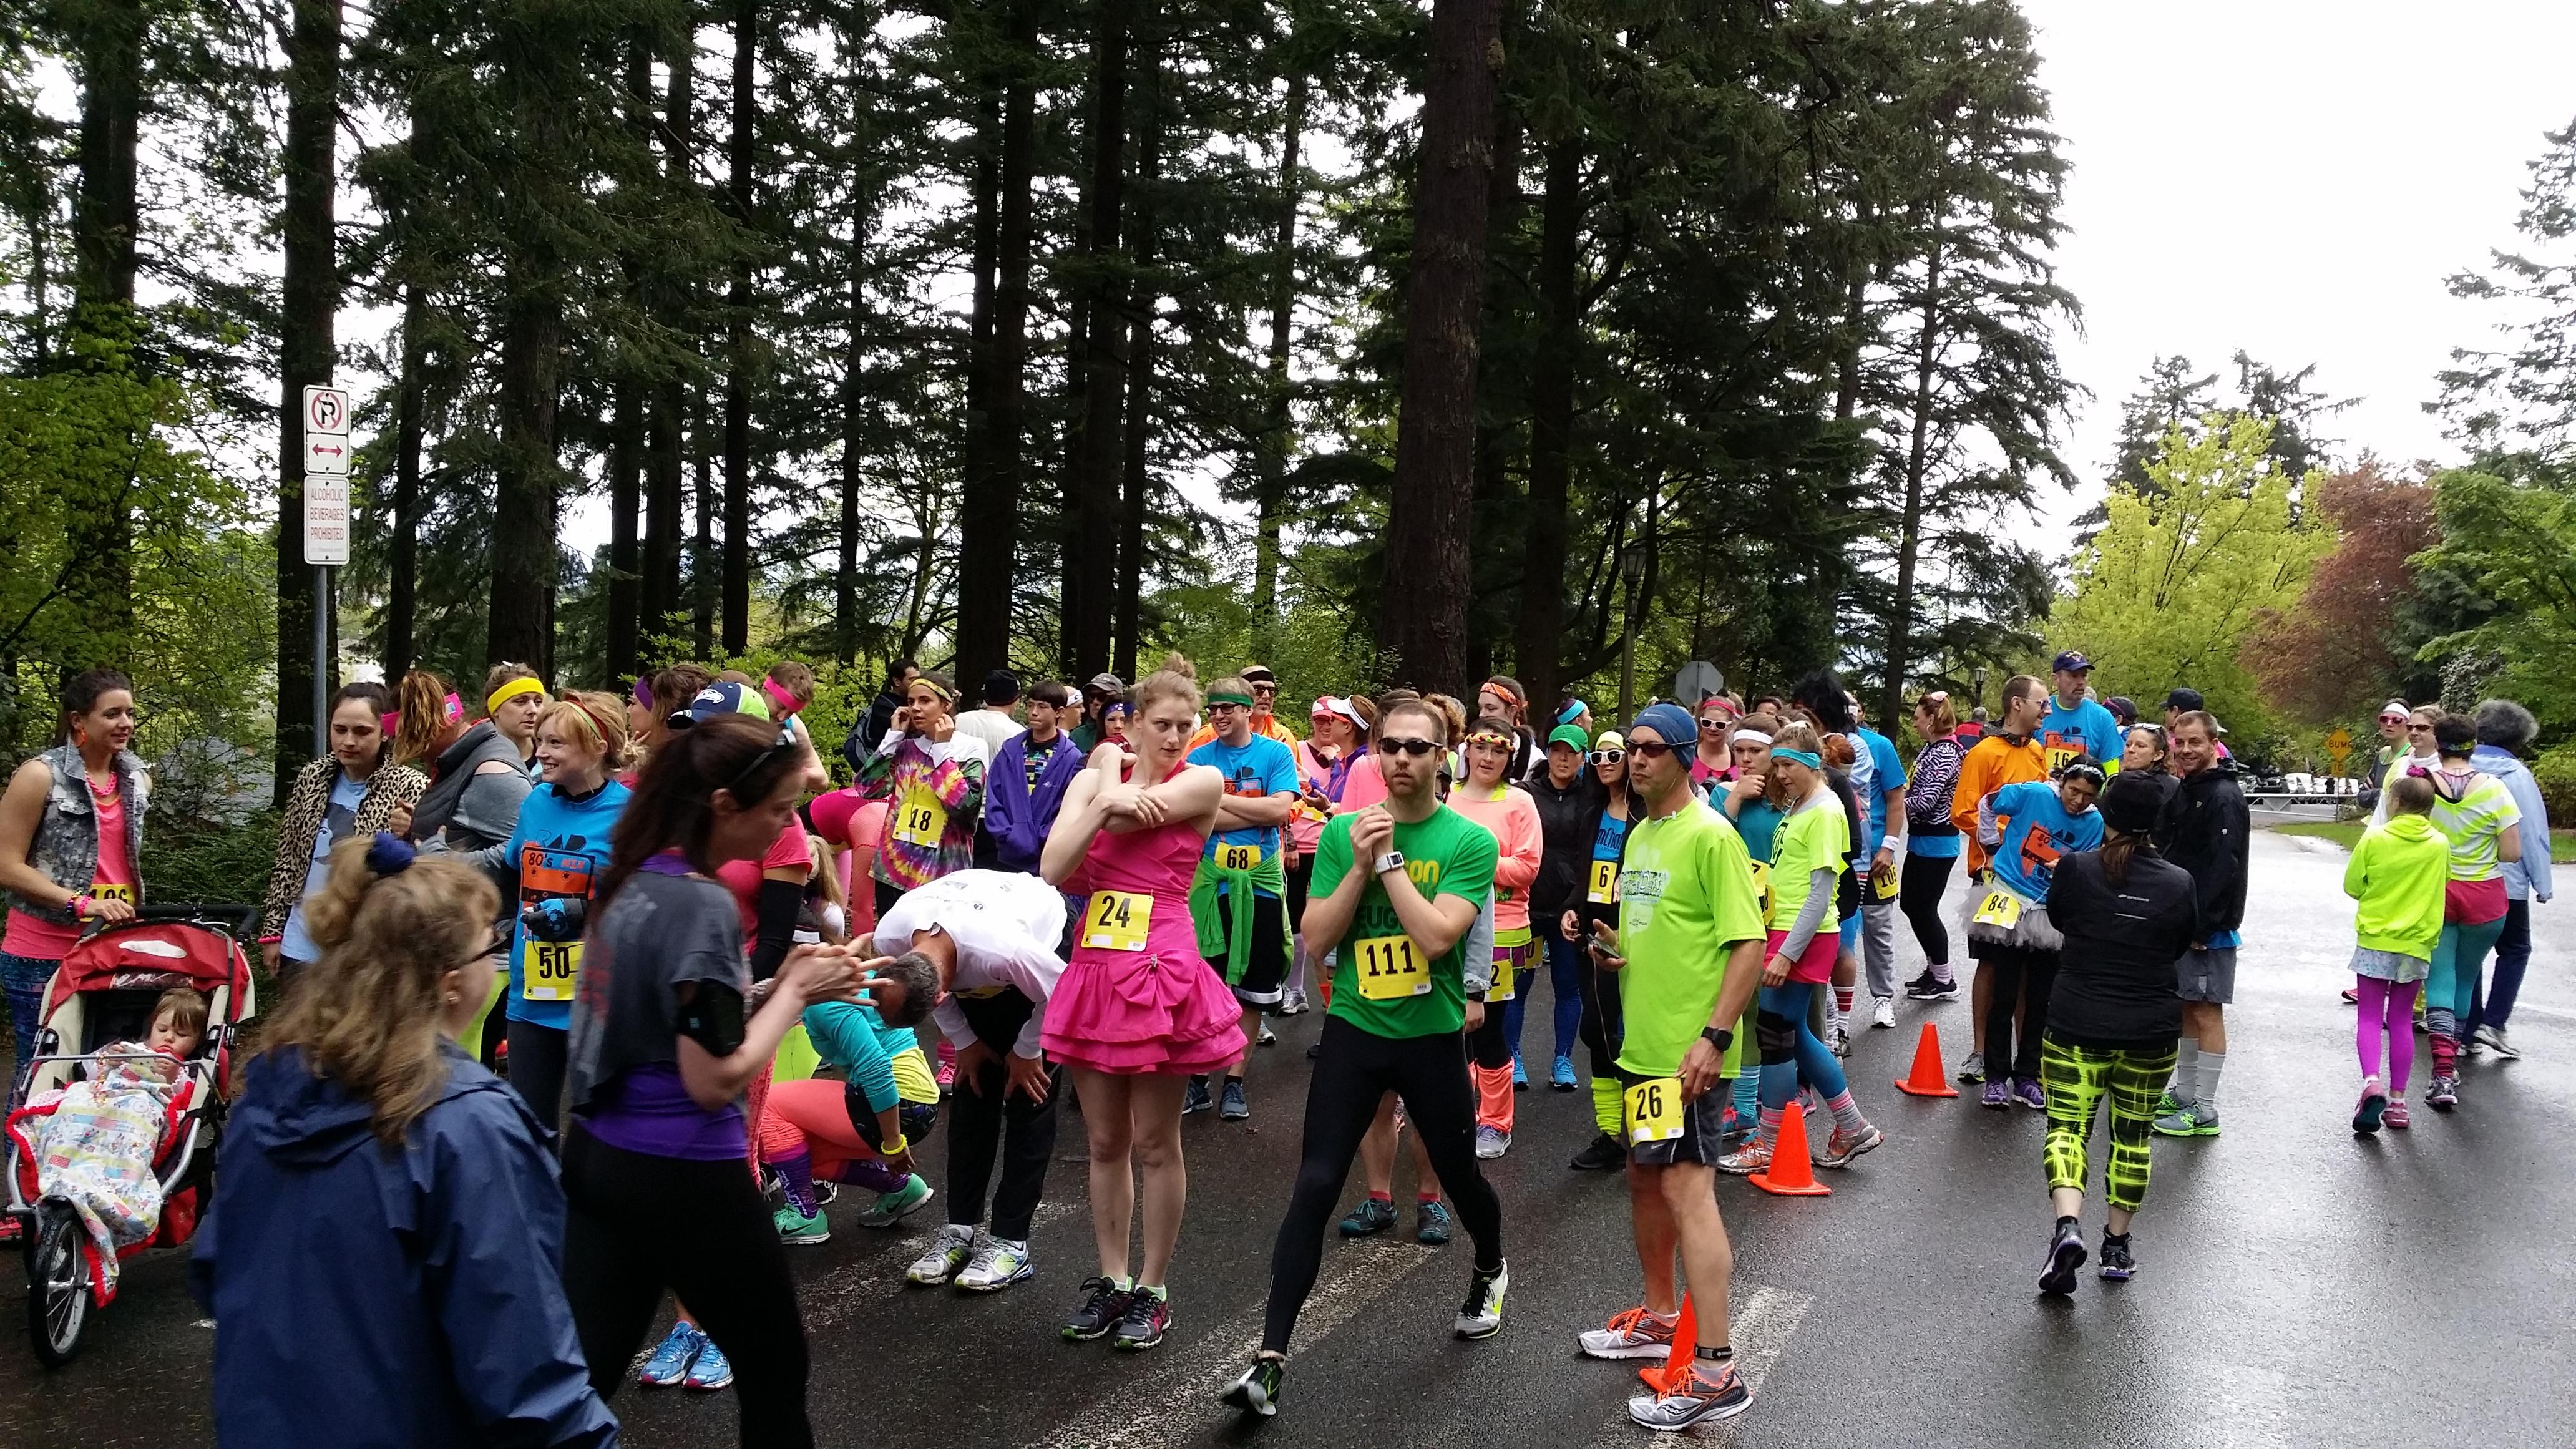 The start of the Rad 80's Run Photo Credit: Amber Corsen